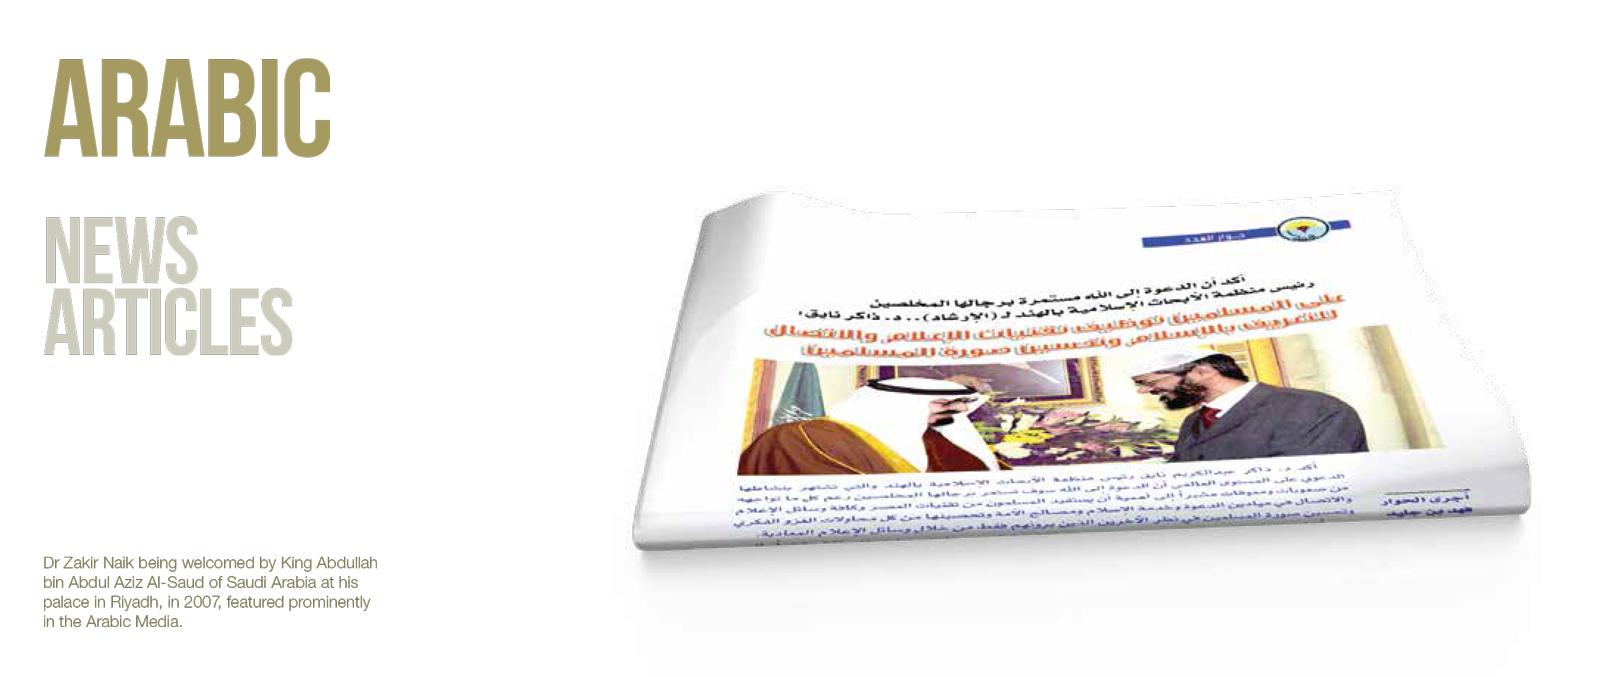 Media Reports - Arabic